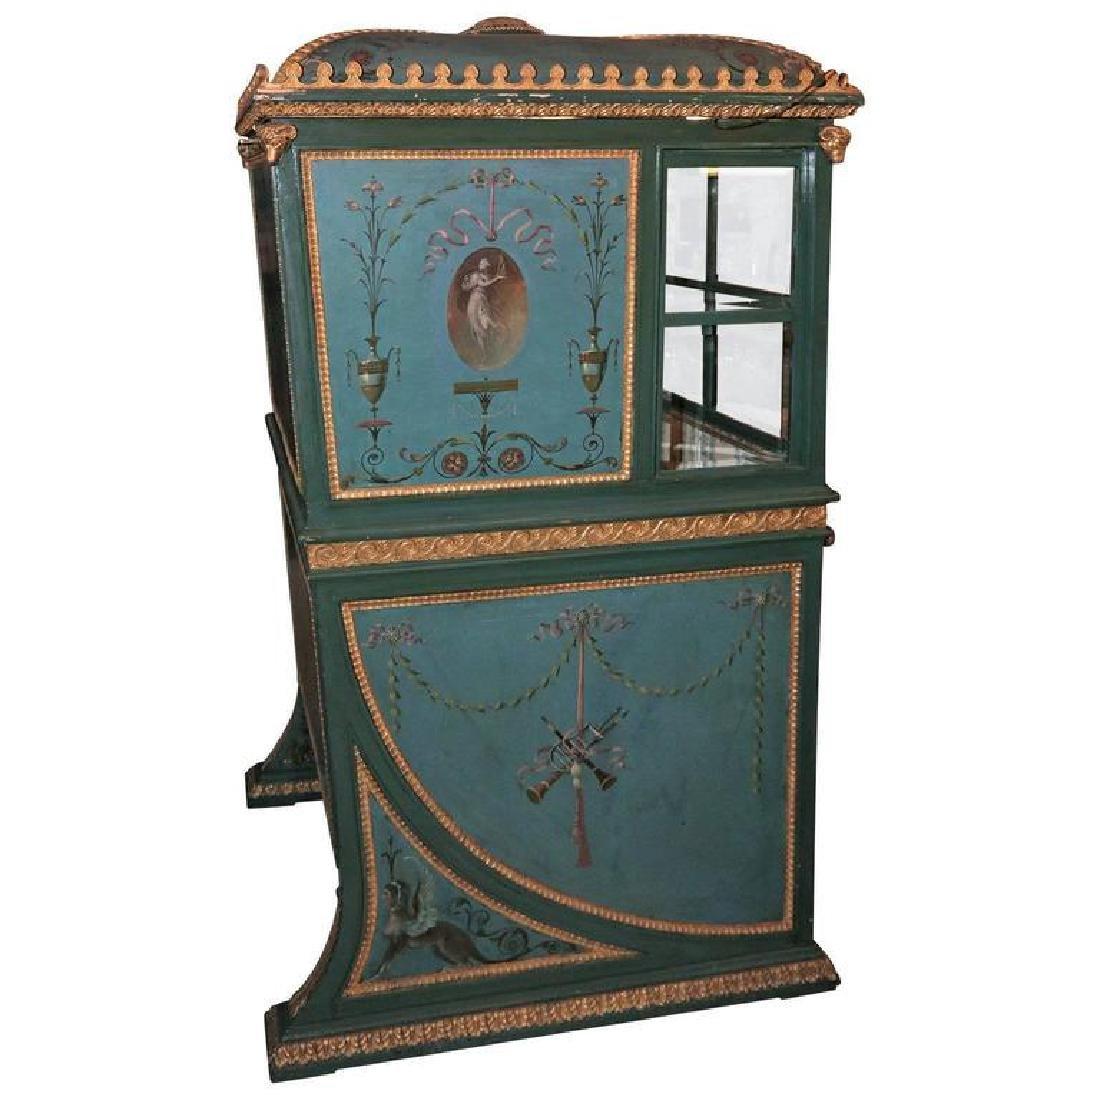 19th Century Venetian Giltwood Hand-Painted Sedan Chair